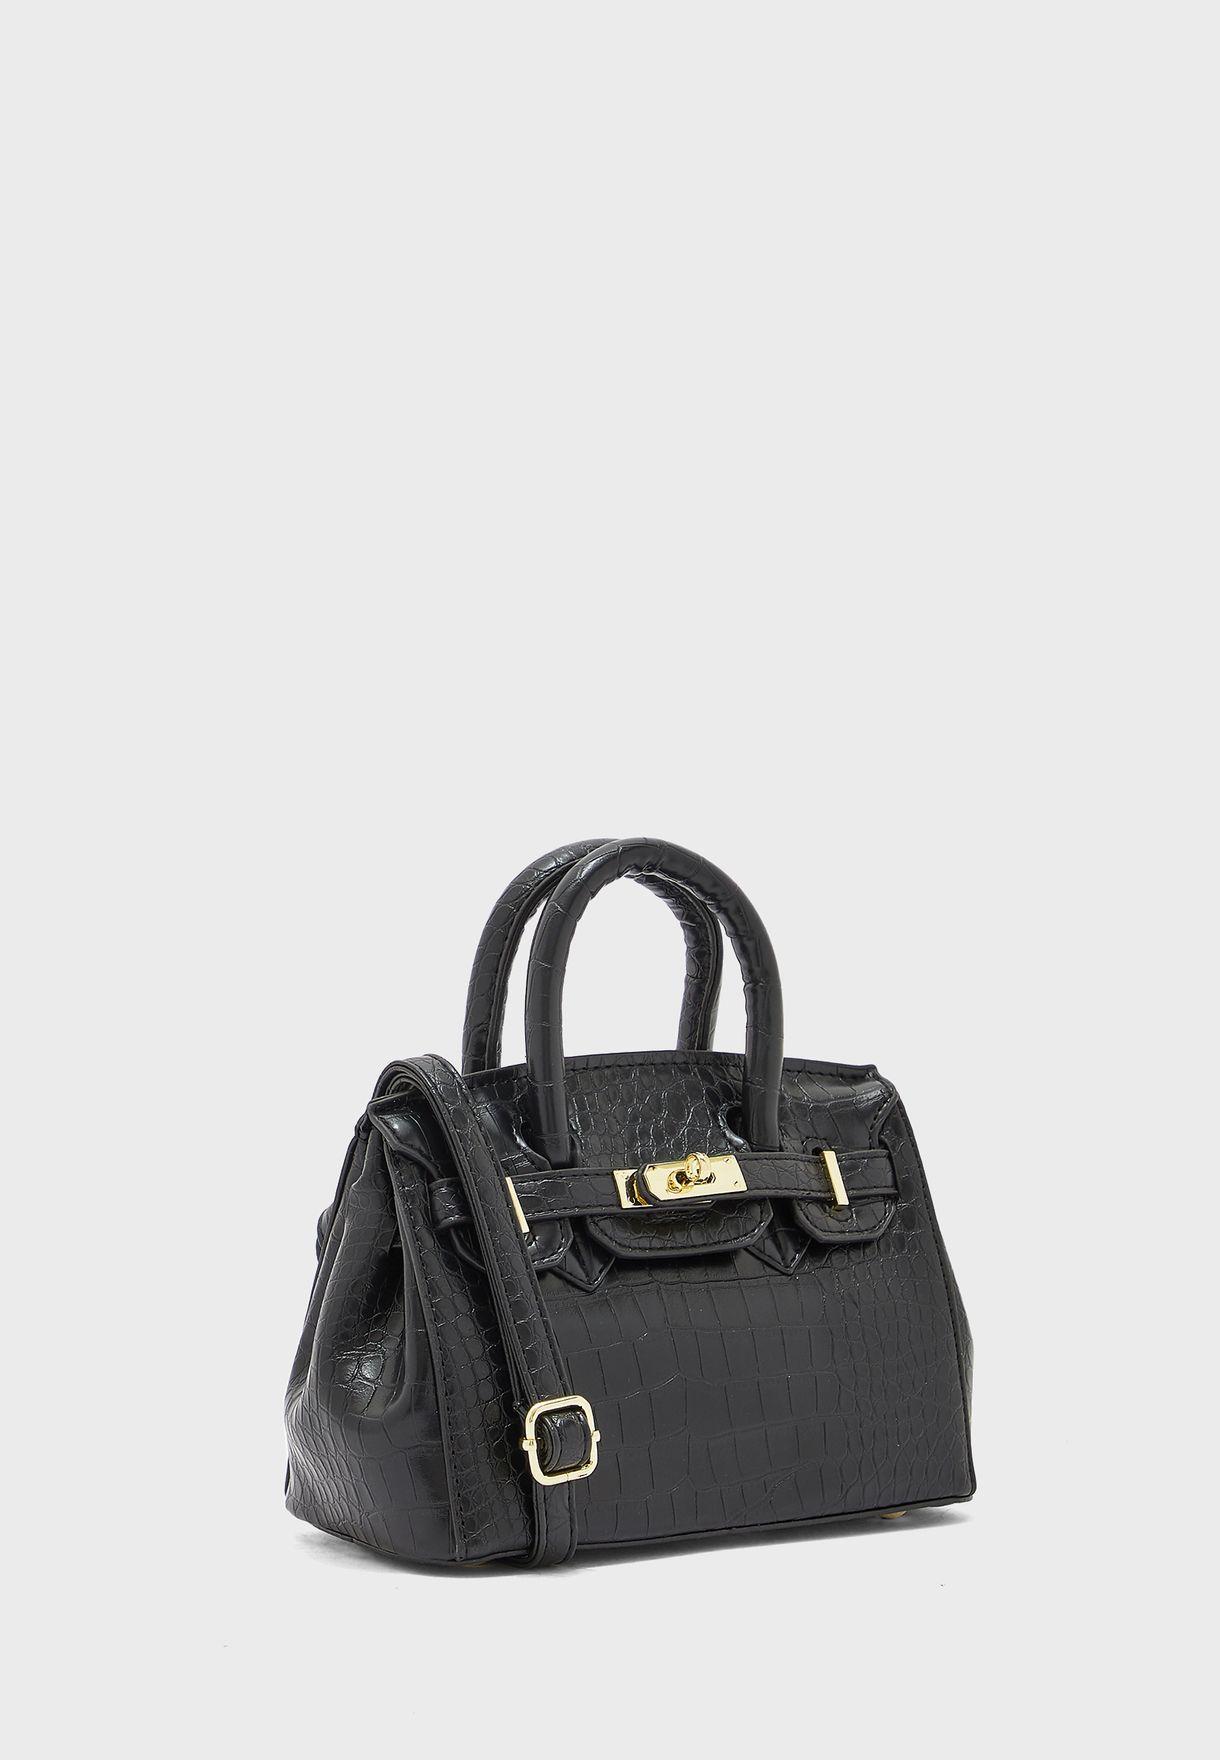 Croc Top Handle Handbag